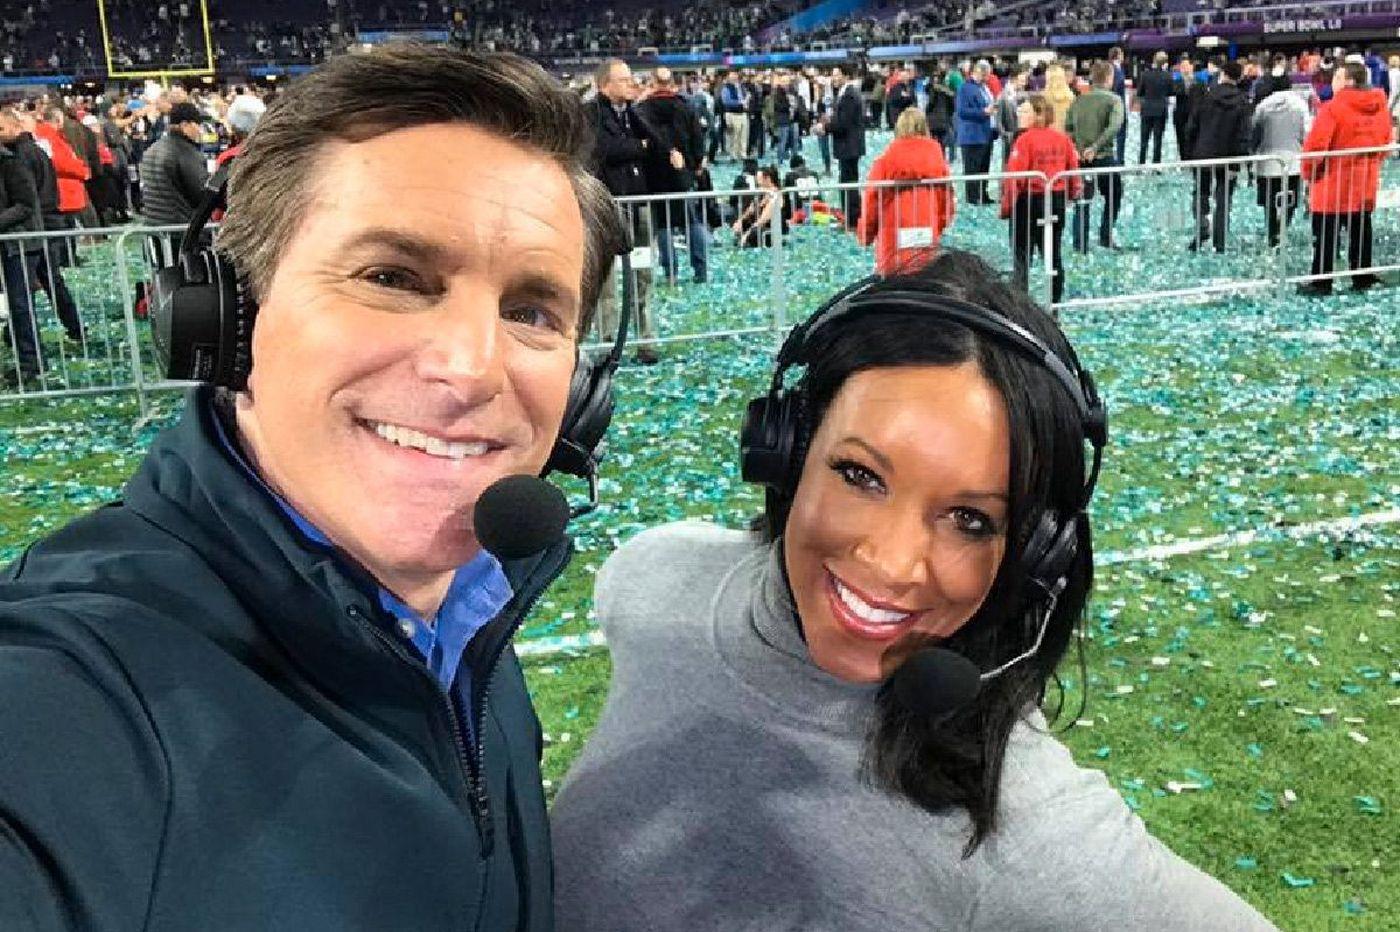 Winter Olympics TV ratings: NBC10 a big winner